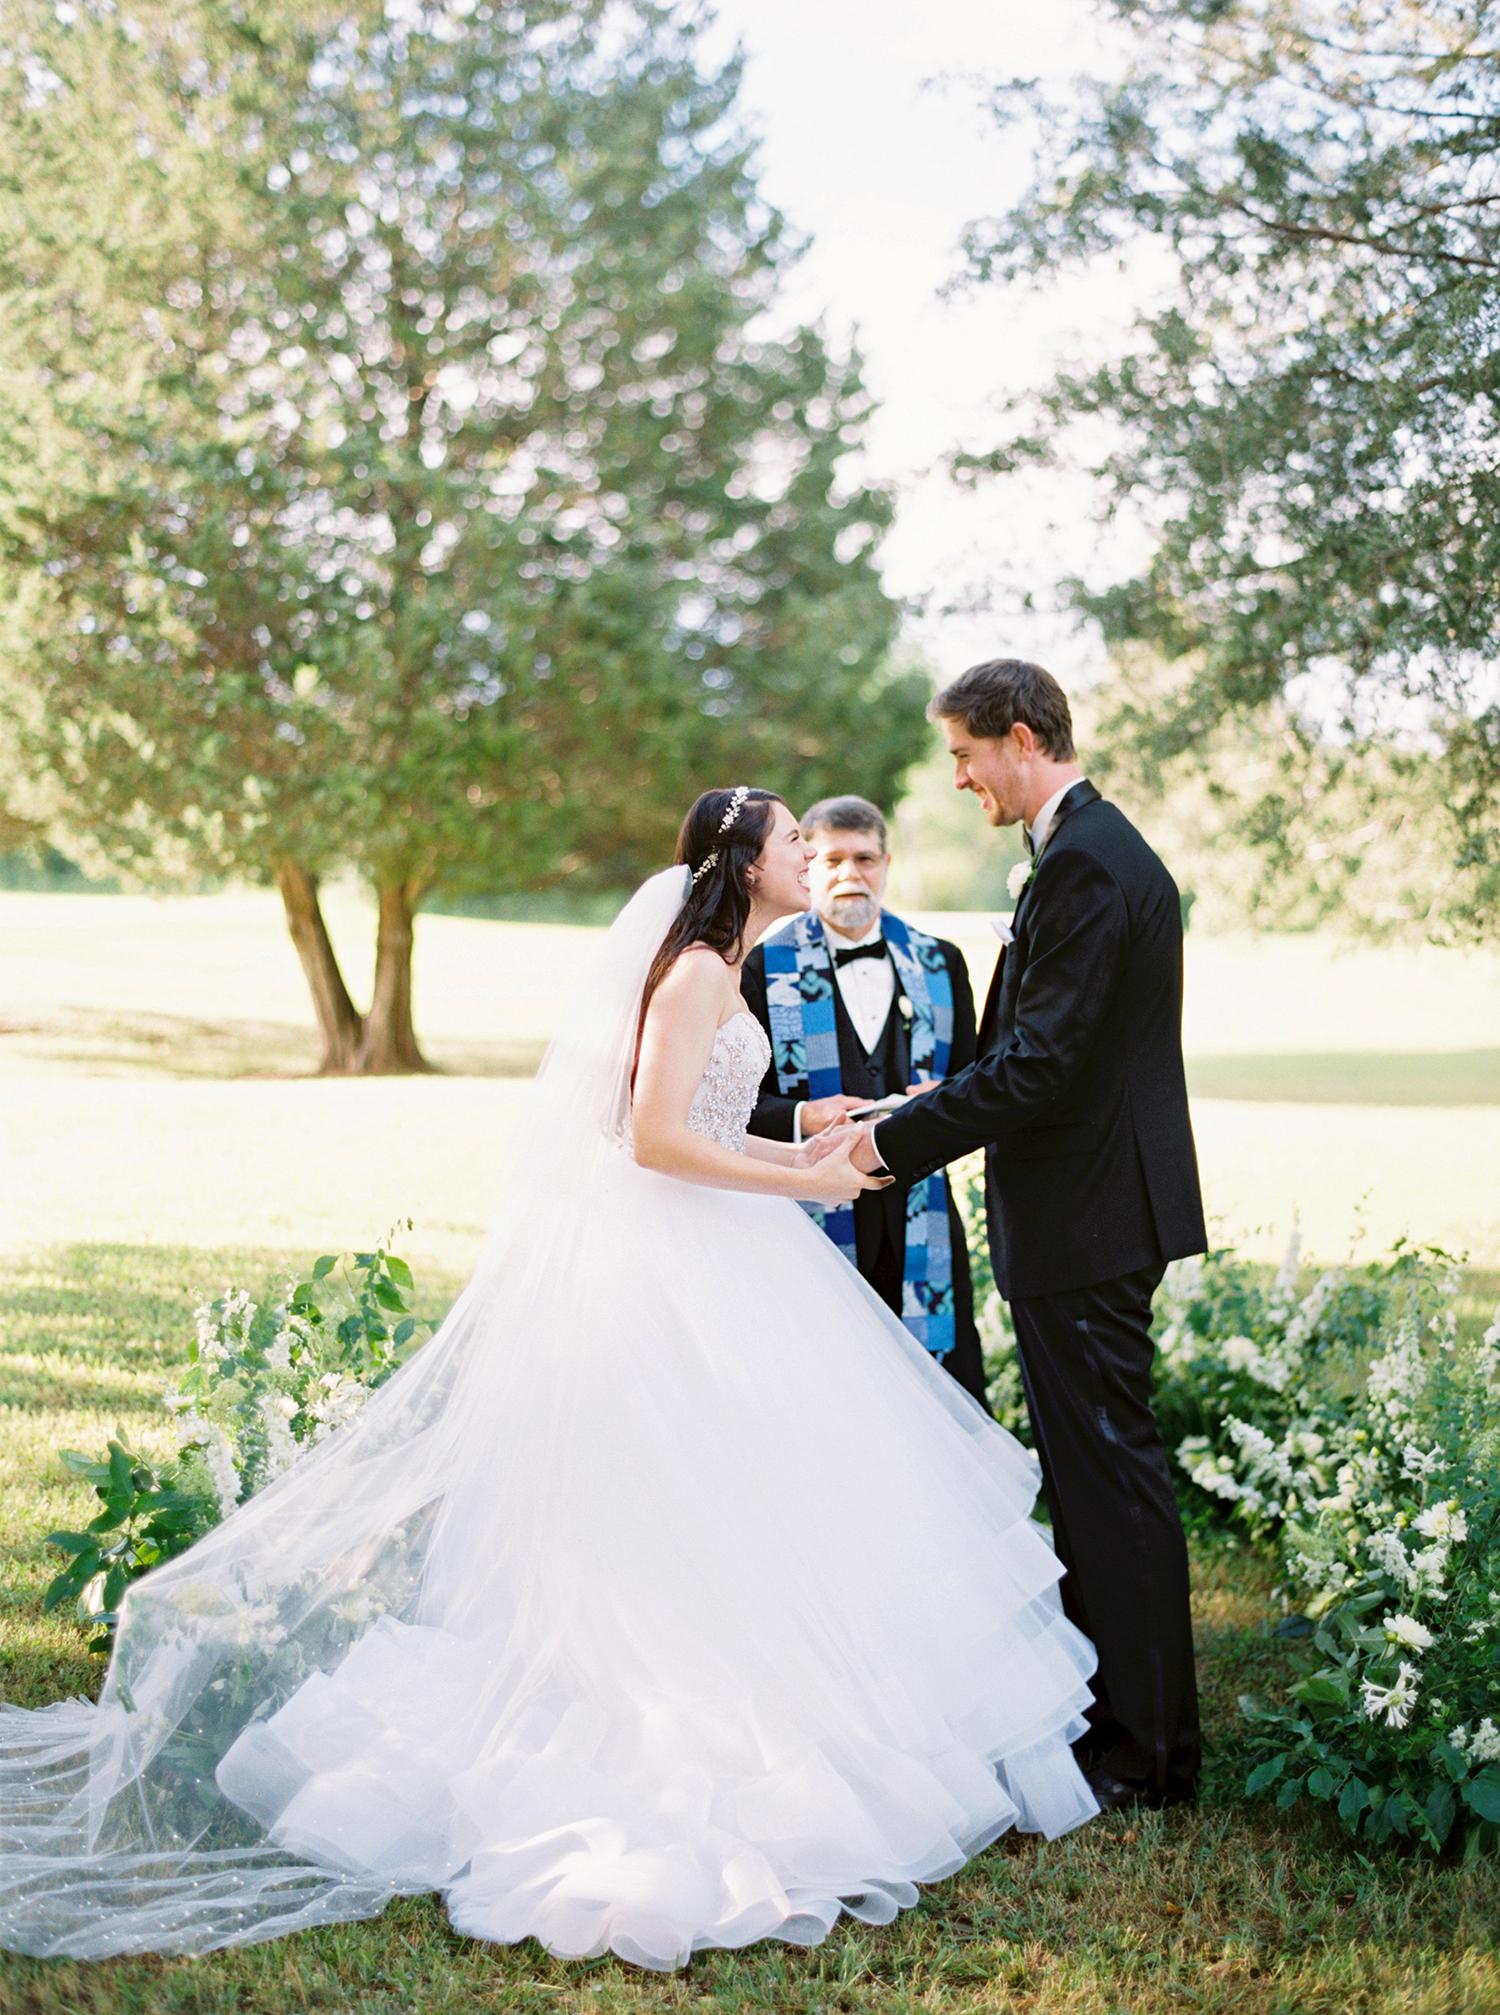 dani jackson wedding ceremony couple laughing